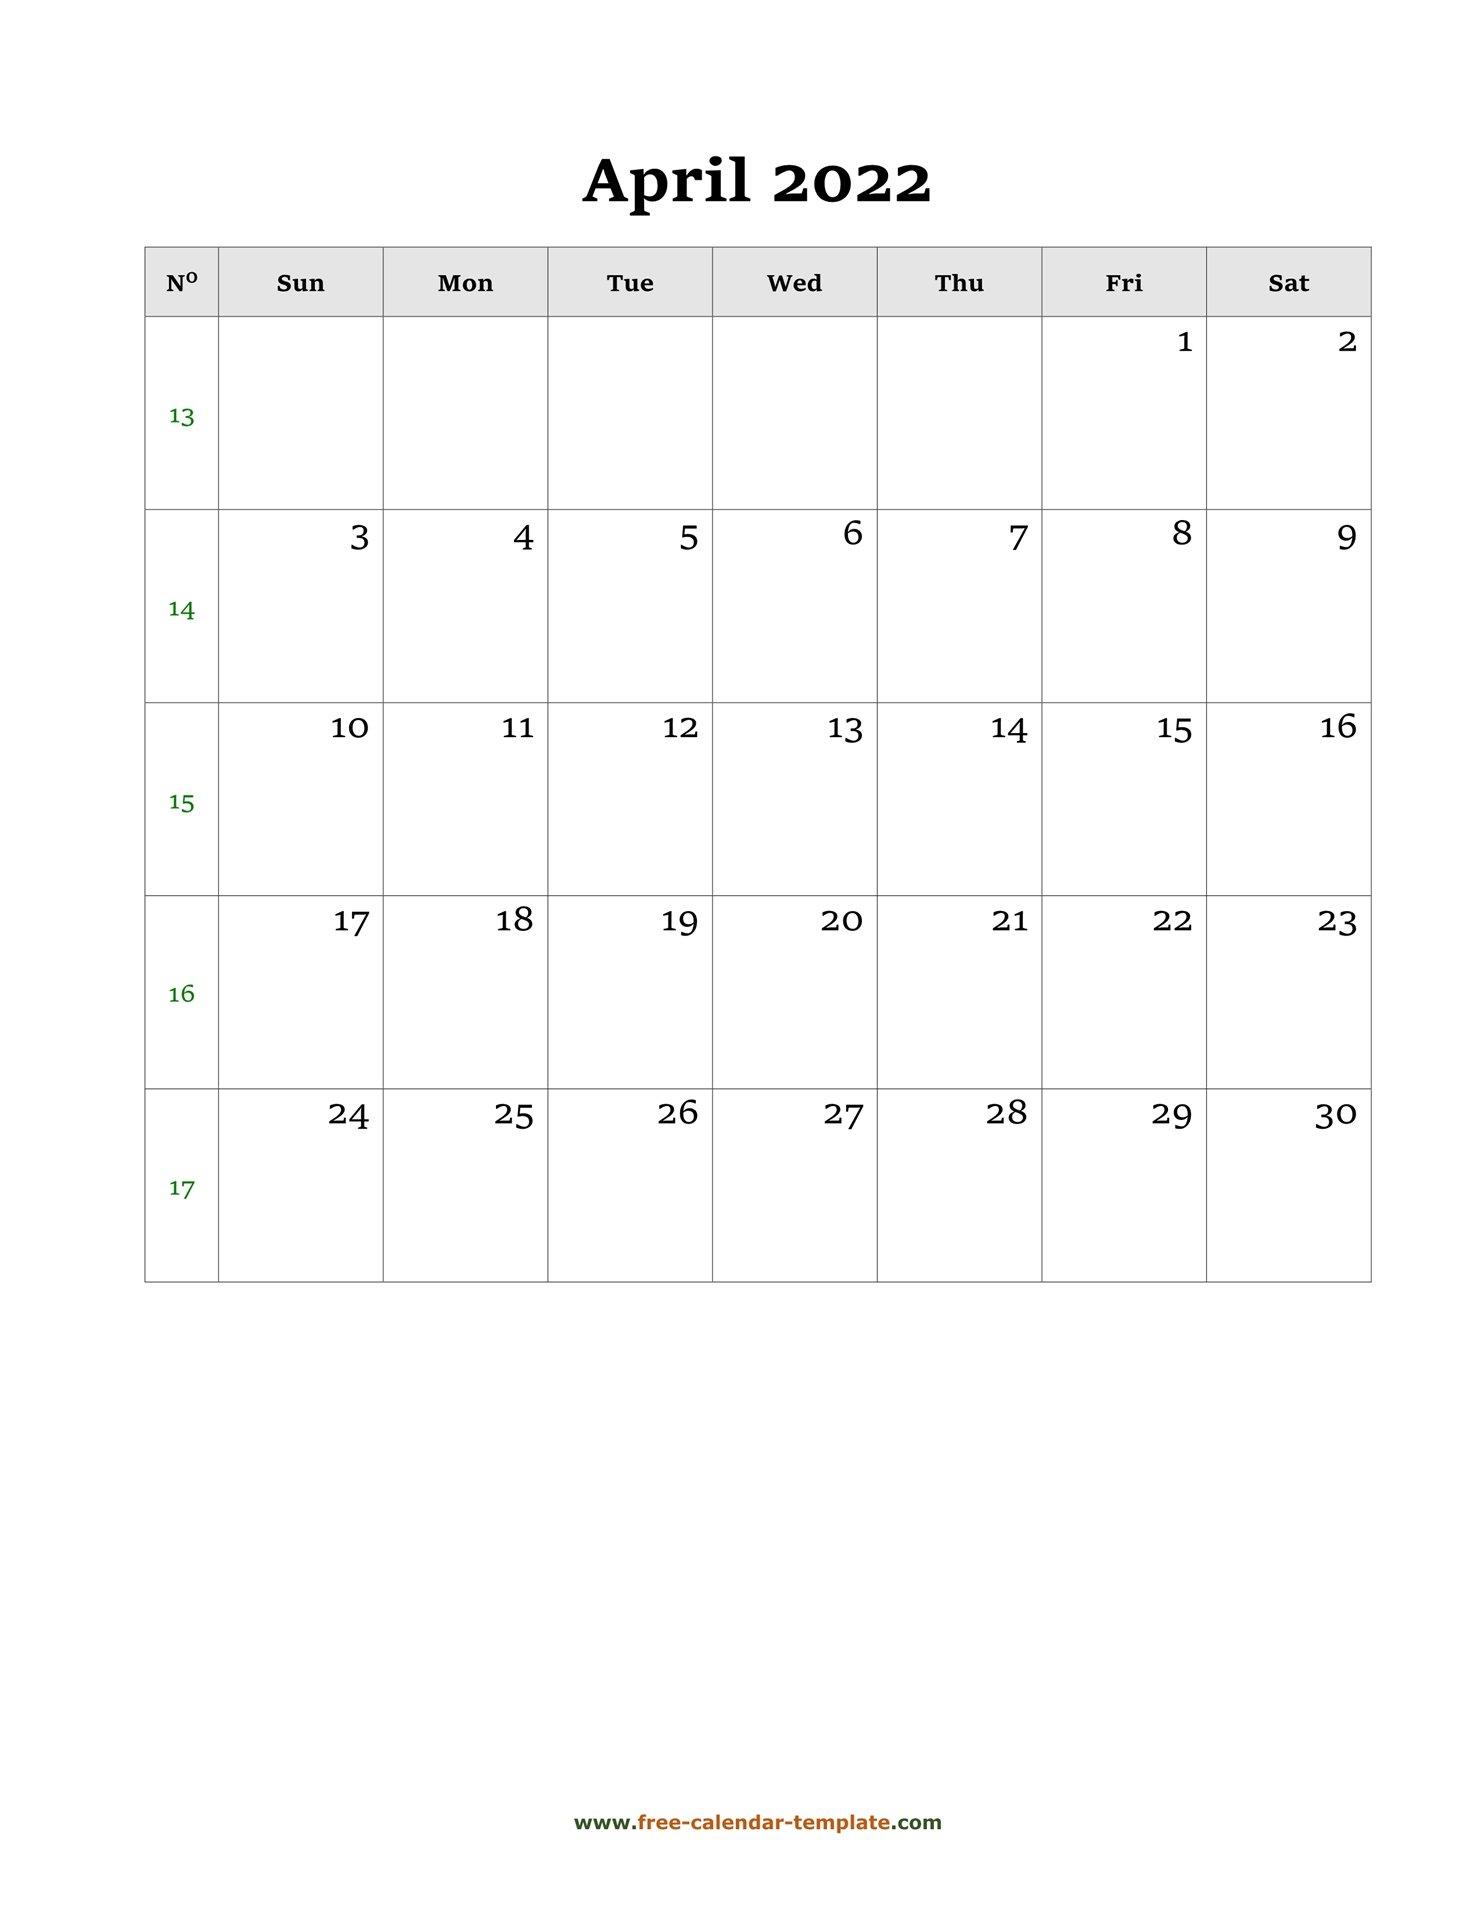 April Calendar 2022 Simple Design With Large Box On Each regarding April 2022 Calendar Printable Images Photo